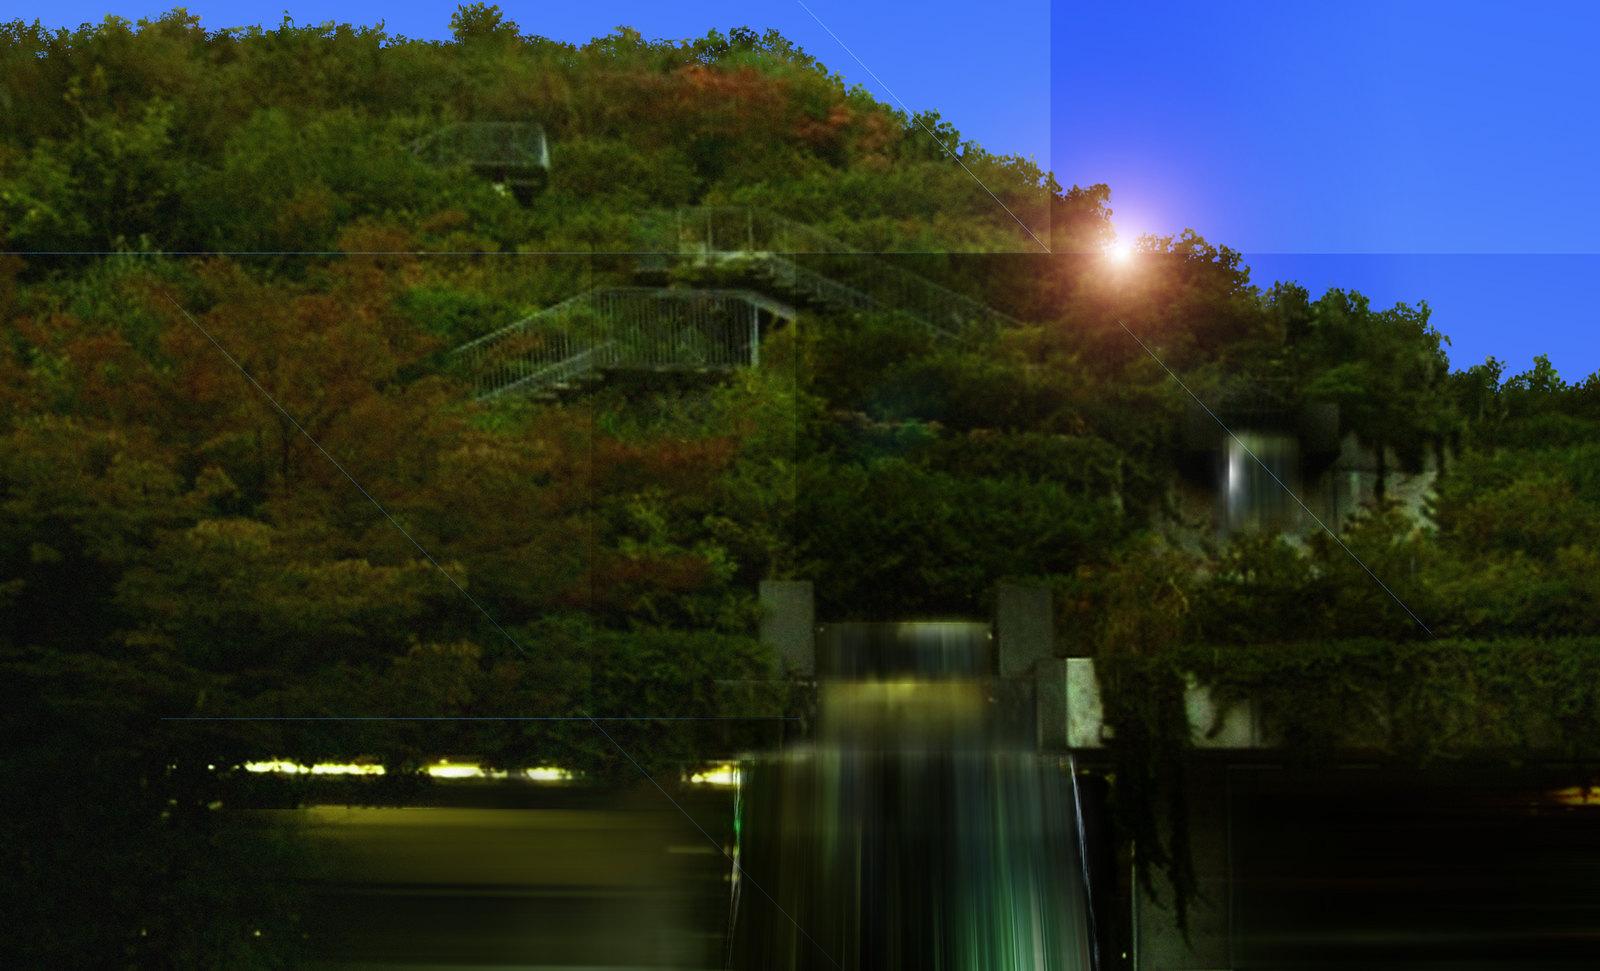 Fukuoka, ministerio con parque piramidal